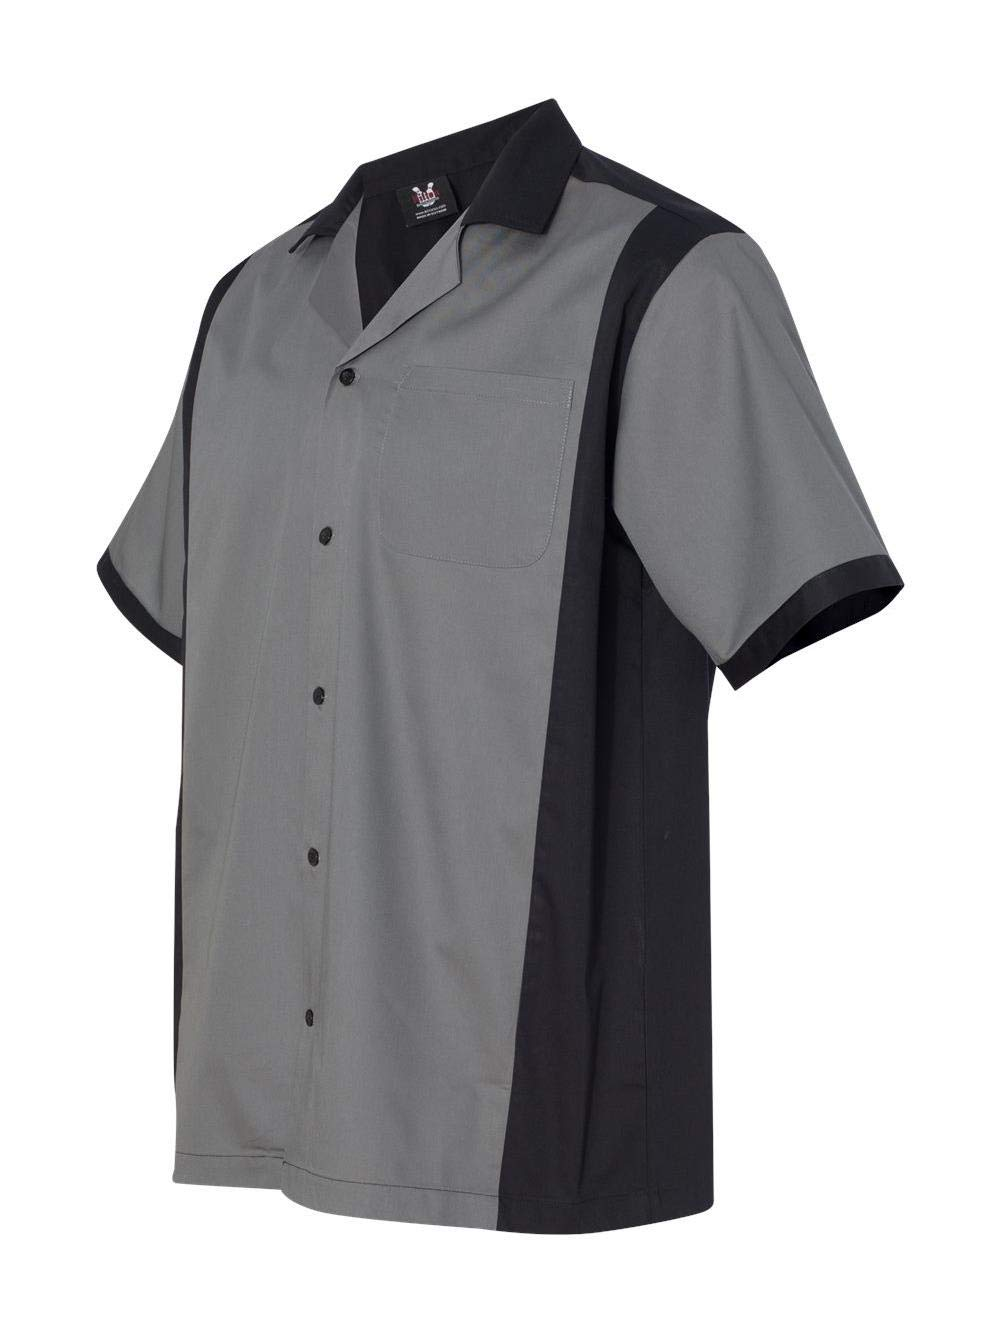 Hilton Cruiser Bowling Shirt 3XL Steel